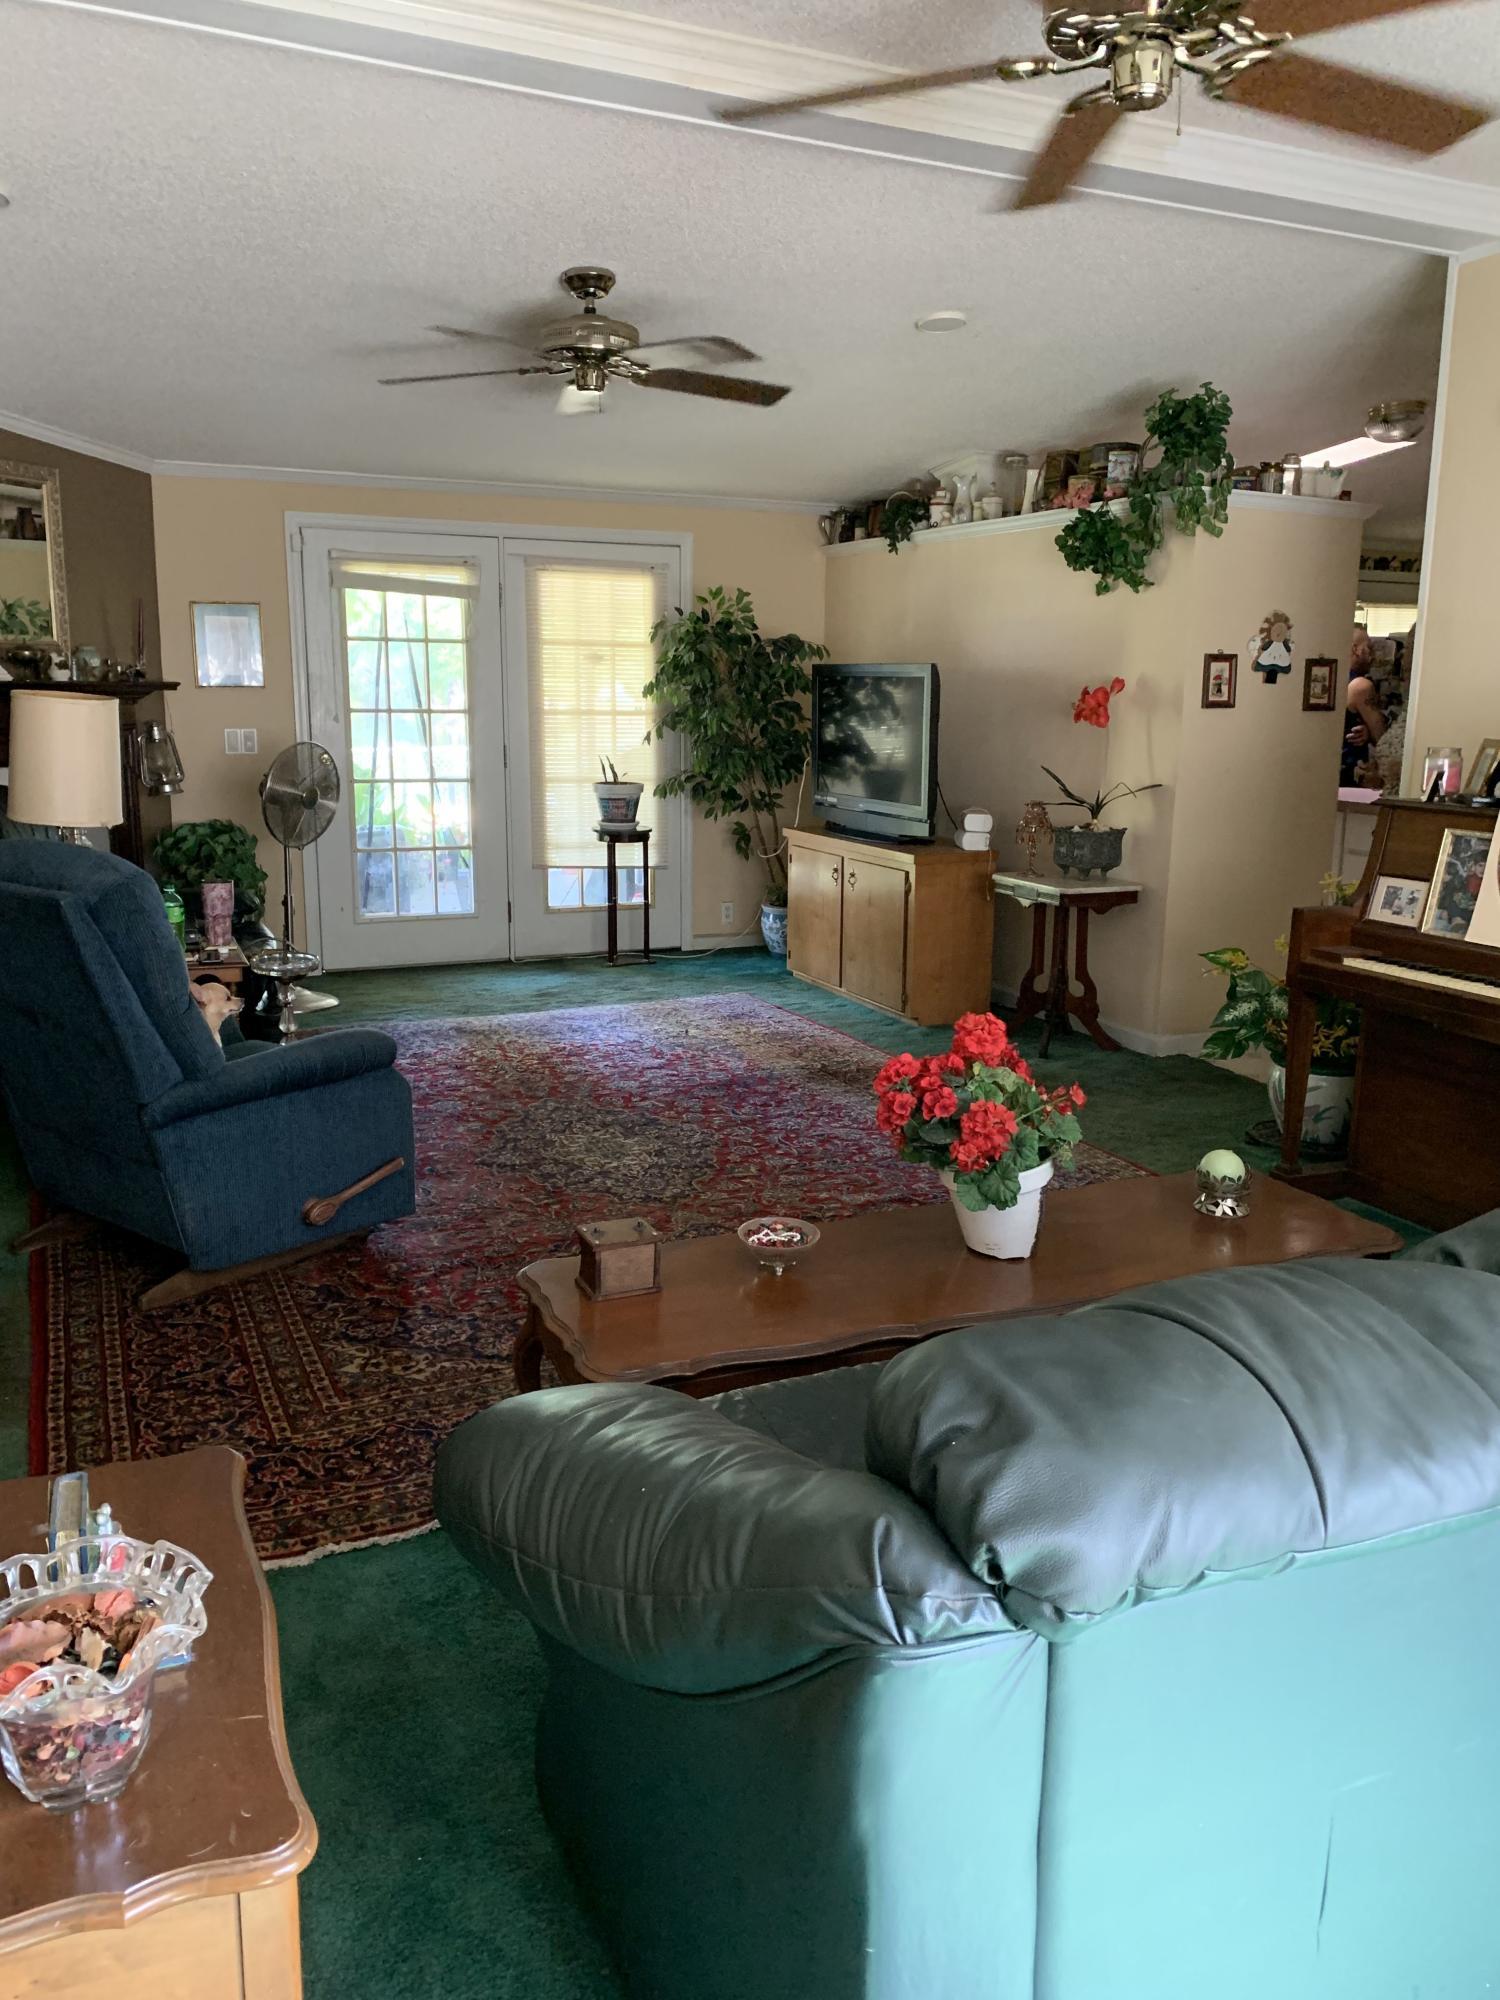 Lebanon Area Homes For Sale - 126 Eagerton, Ridgeville, SC - 7